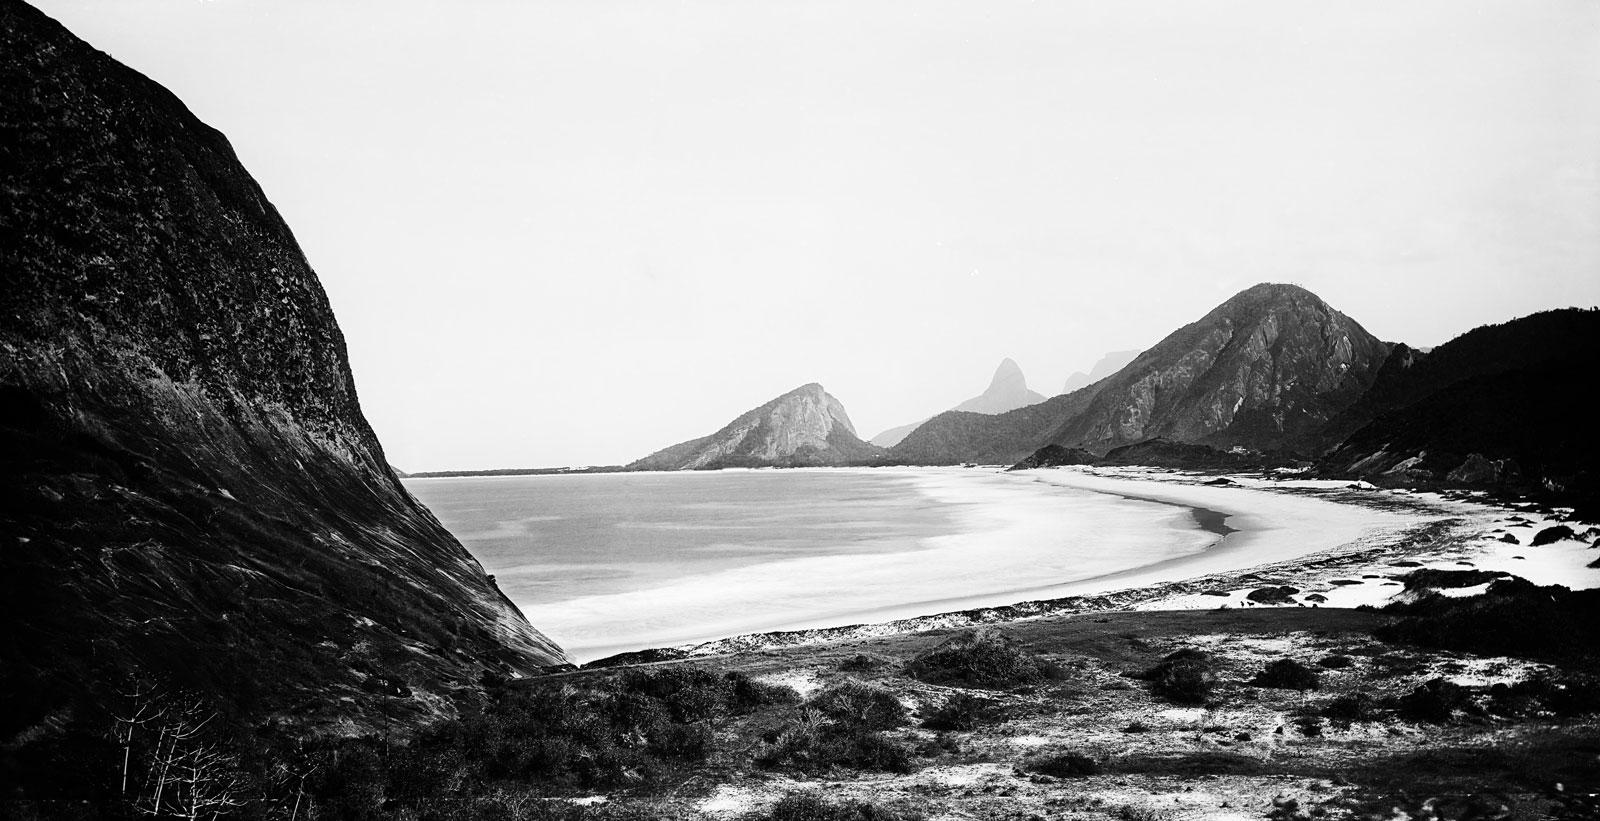 Copacabana Beach viewed from the foot of Leme Hill, circa 1890